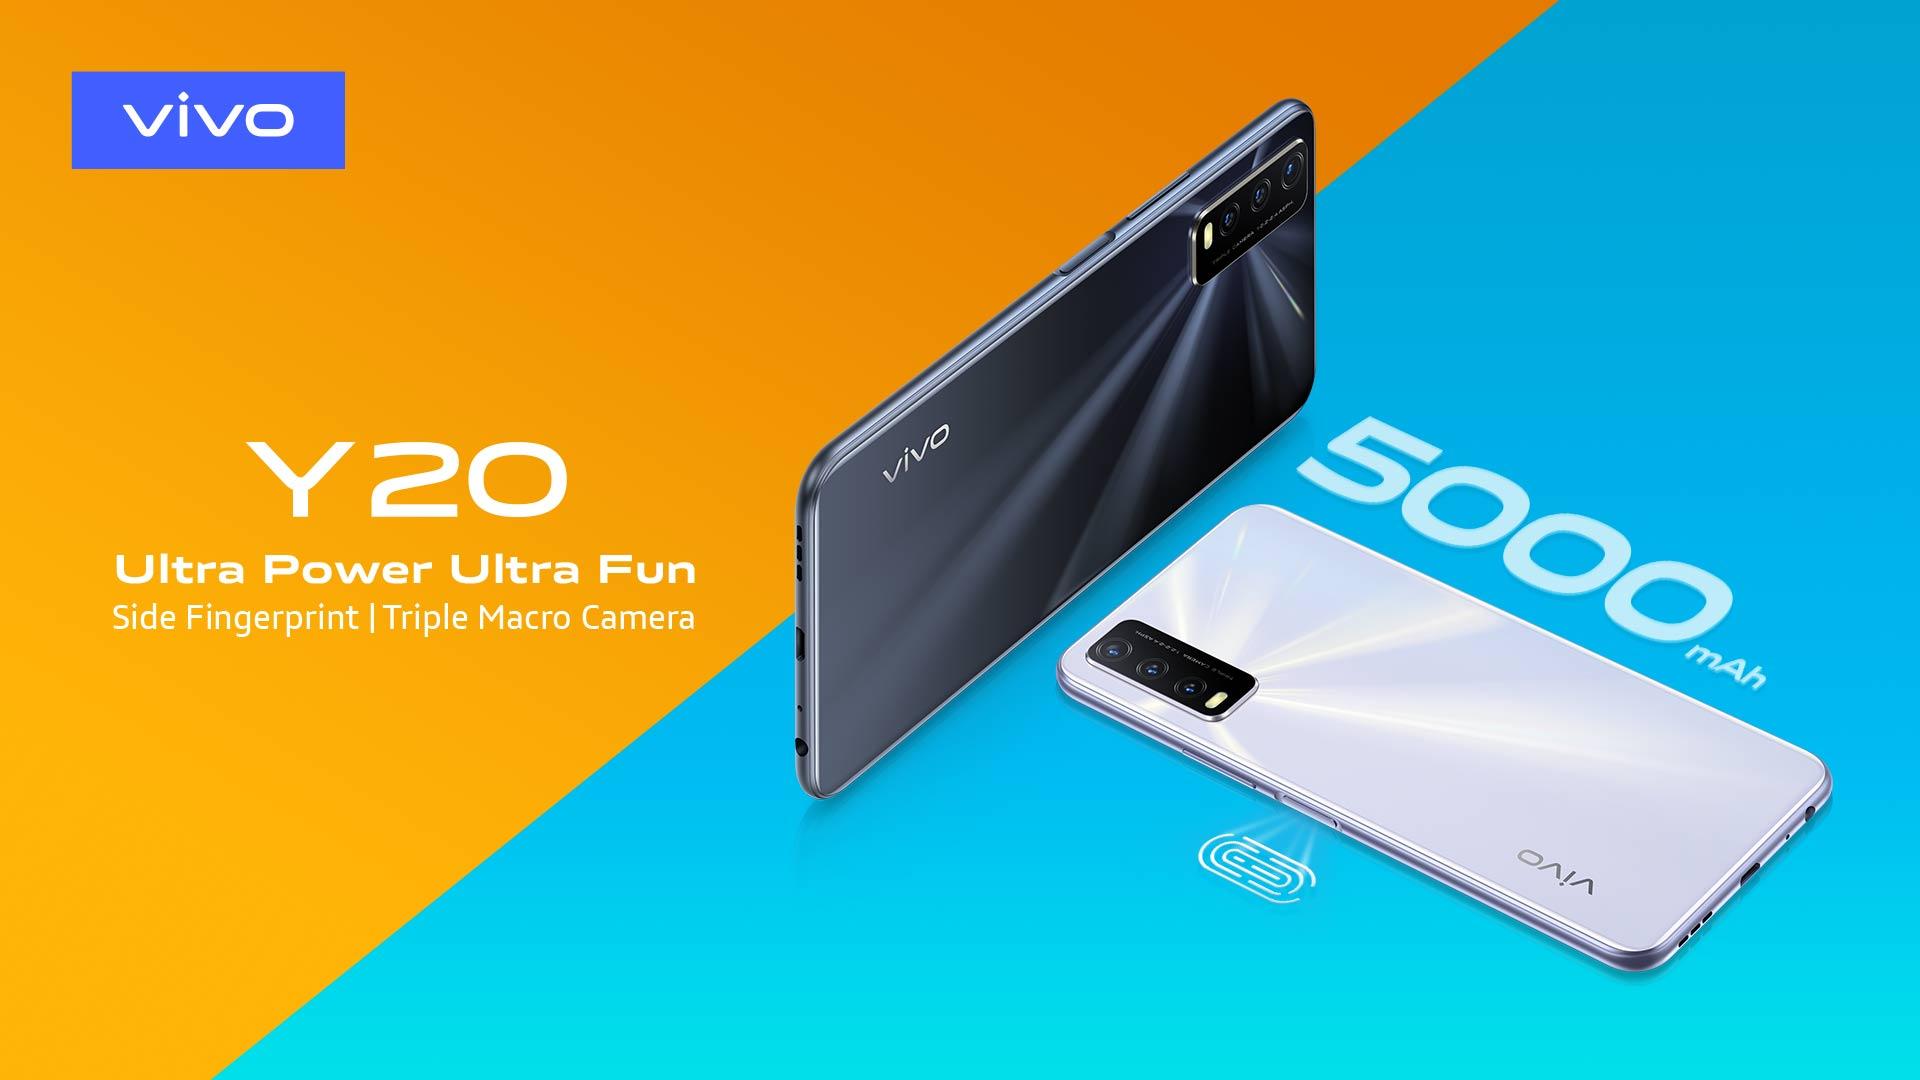 Vivo Y20 to launch in Kenya in October